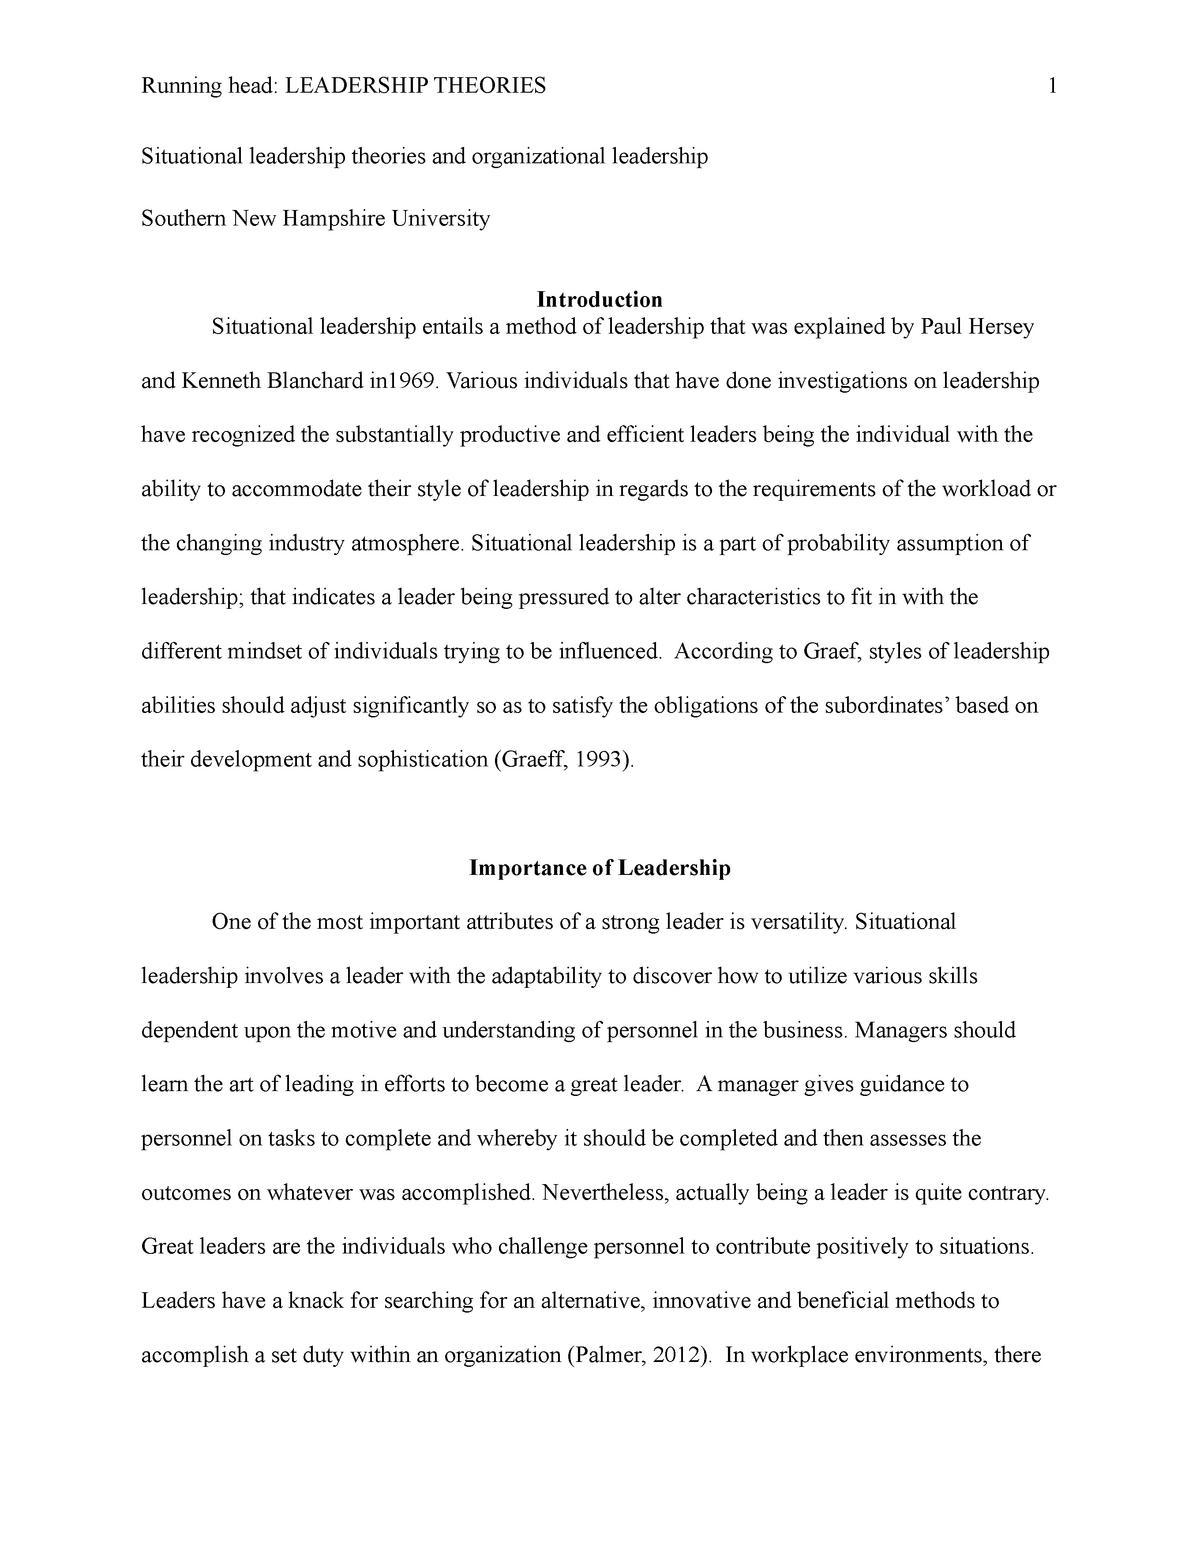 Situational Leadership Theory Studocu